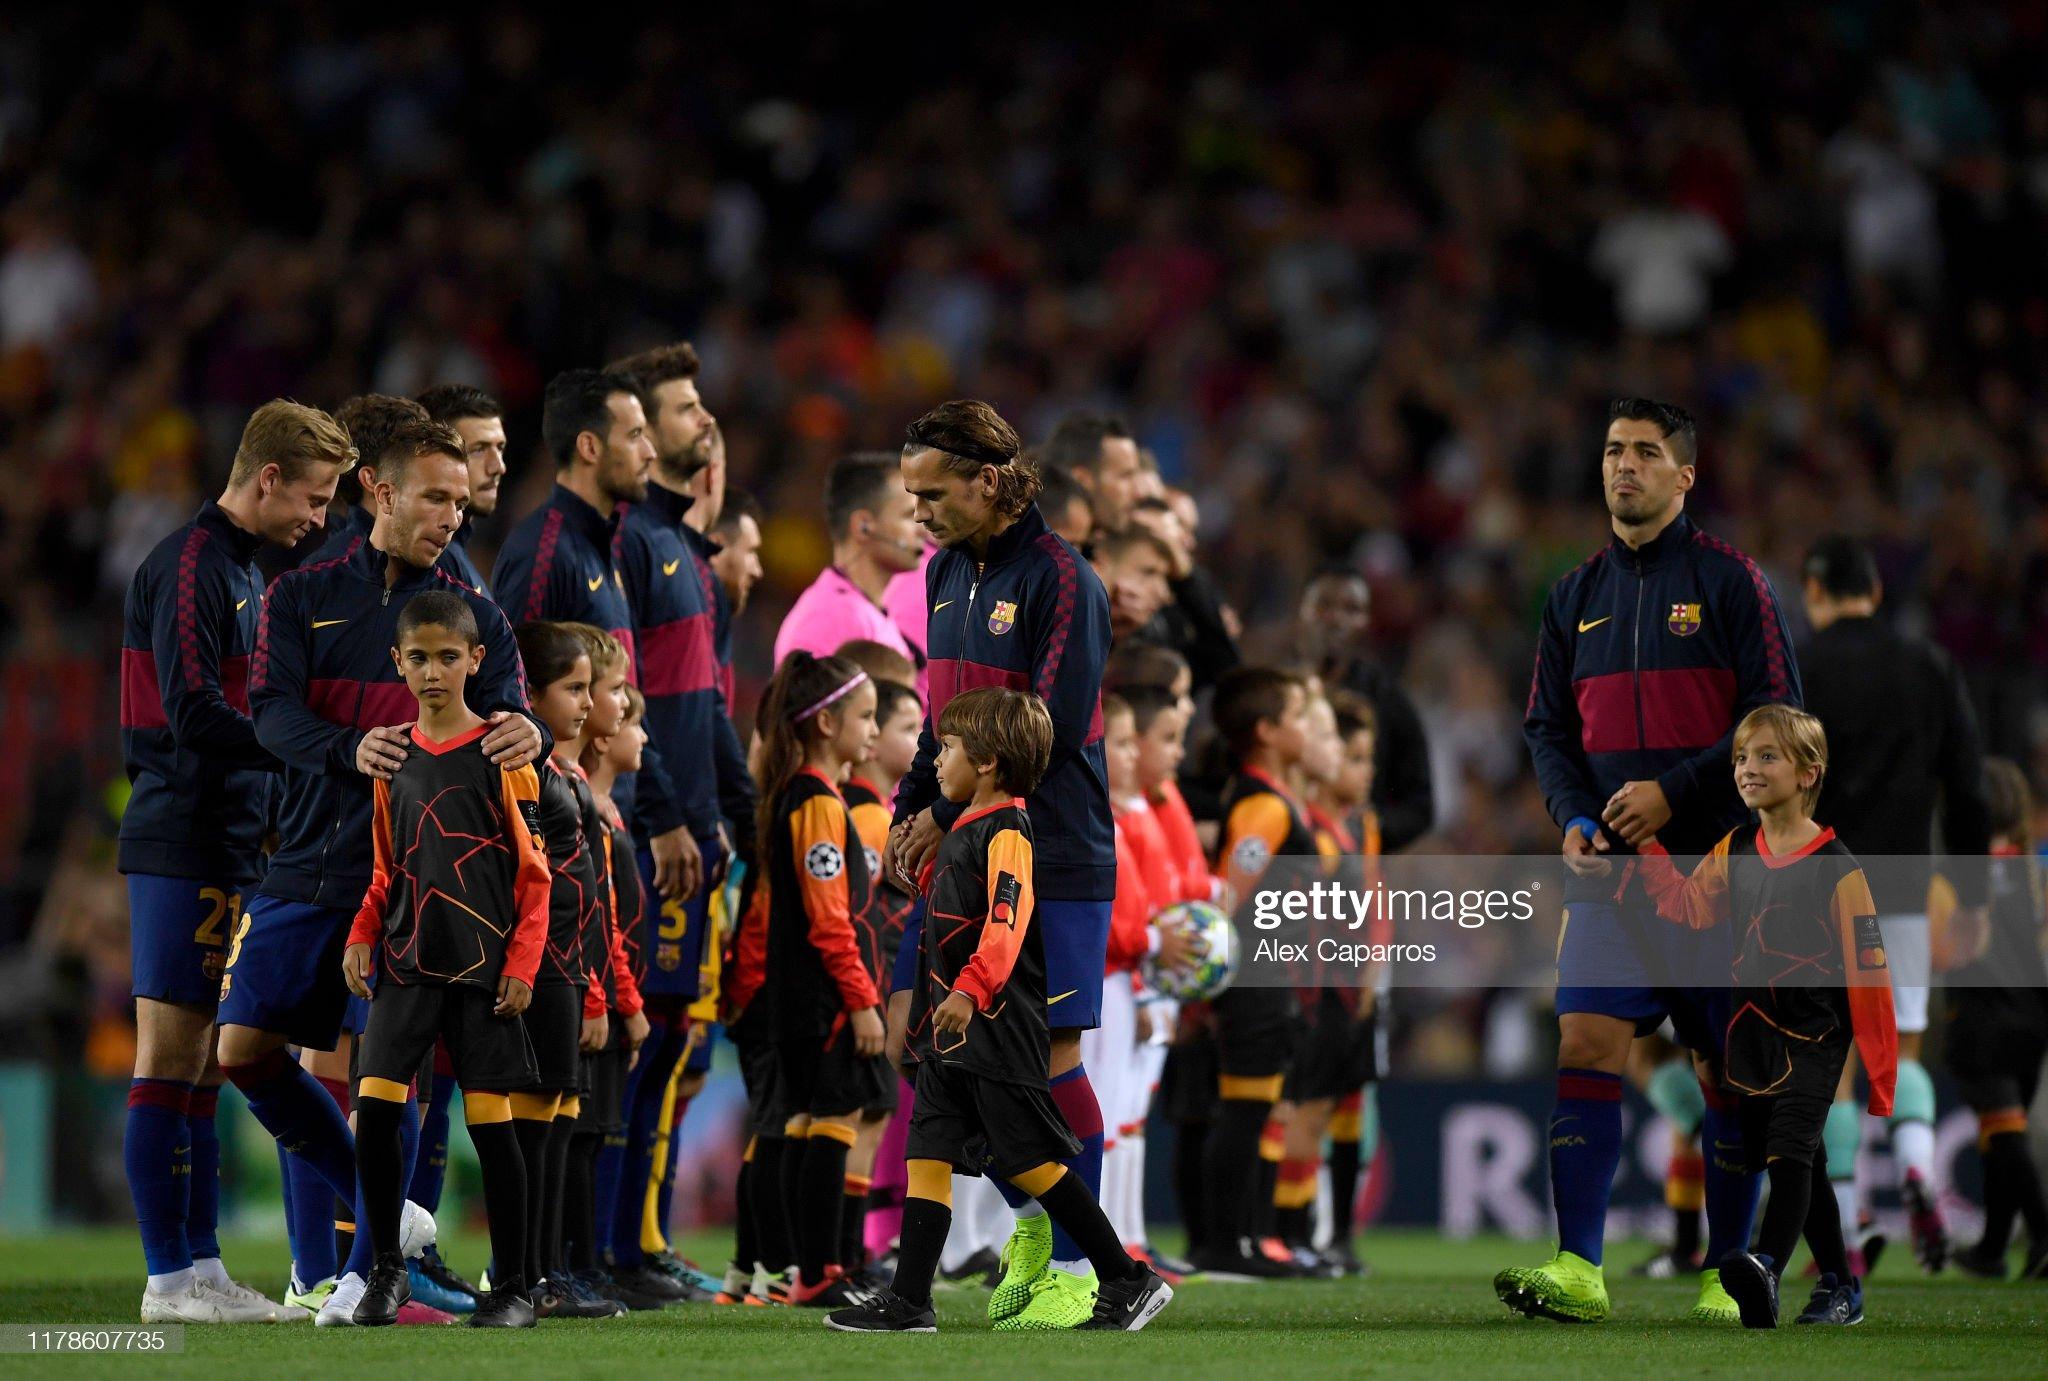 صور مباراة : برشلونة - إنتر 2-1 ( 02-10-2019 )  Antoine-griezmann-and-luis-suarez-of-fc-barcelona-make-their-way-out-picture-id1178607735?s=2048x2048